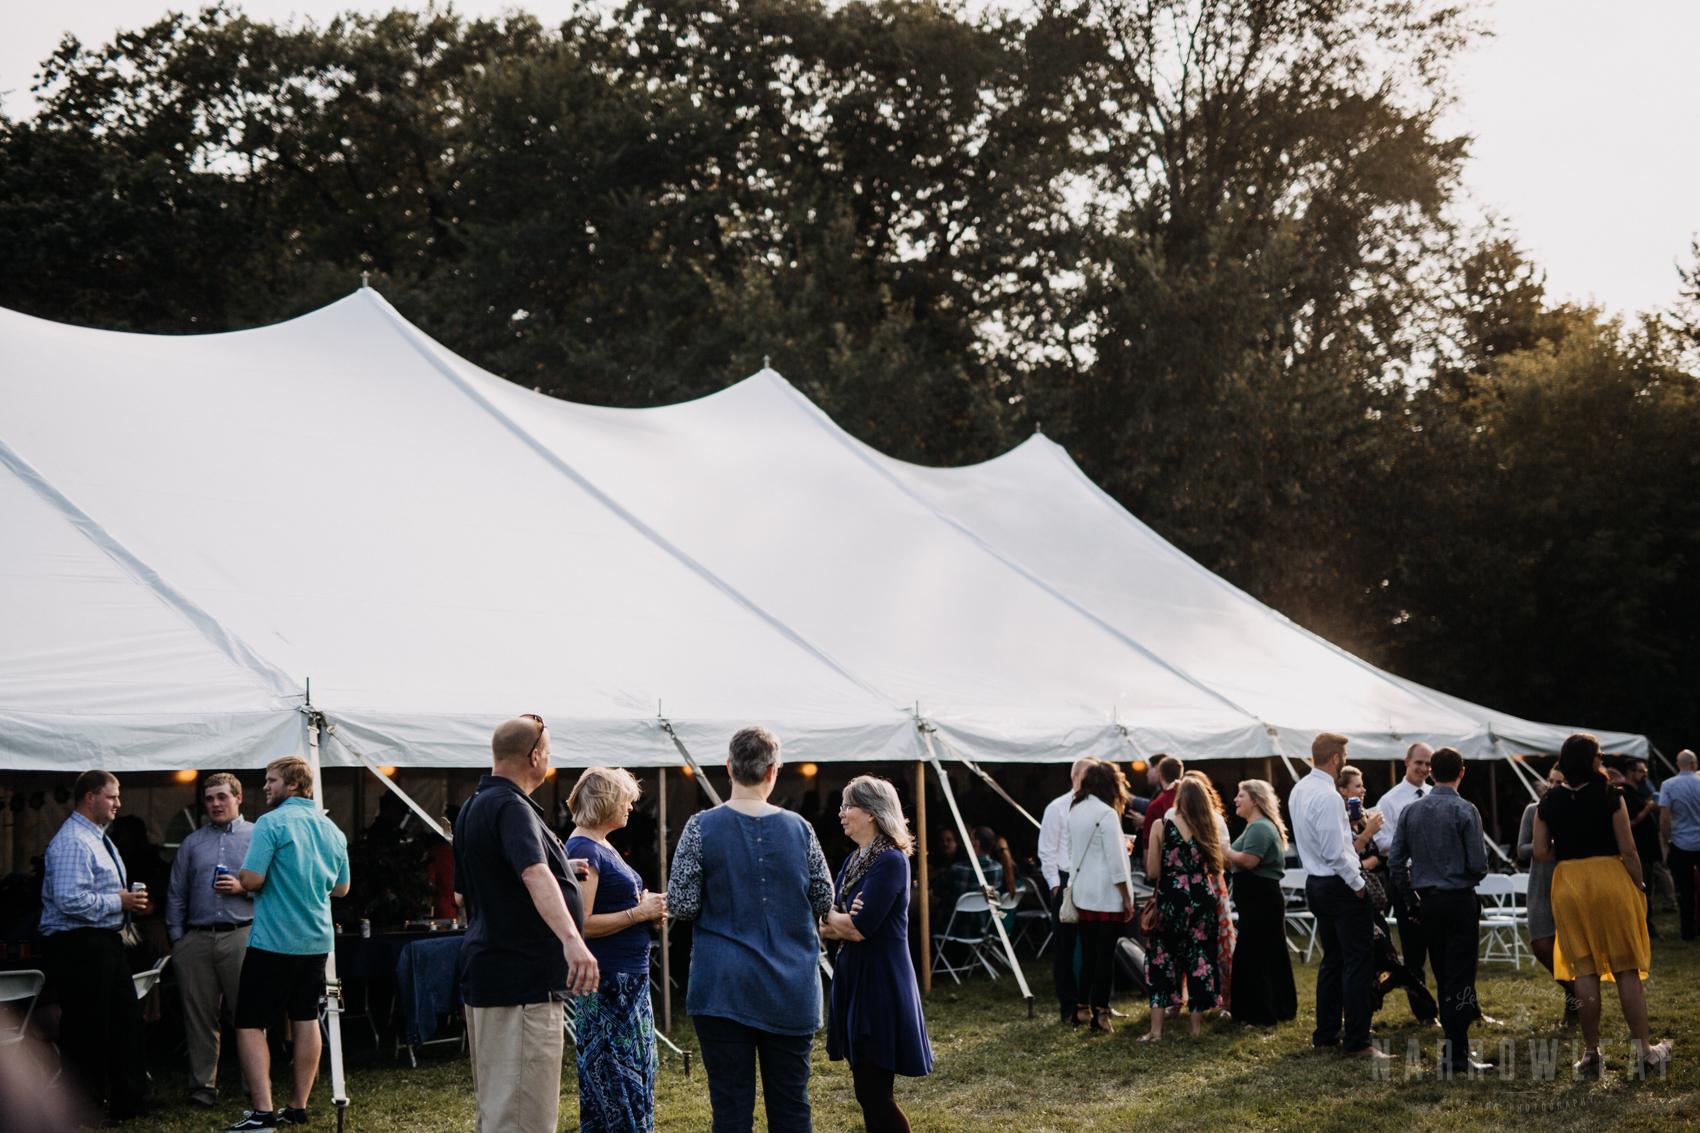 large-jenga-tent-wedding-reception--33.jpg